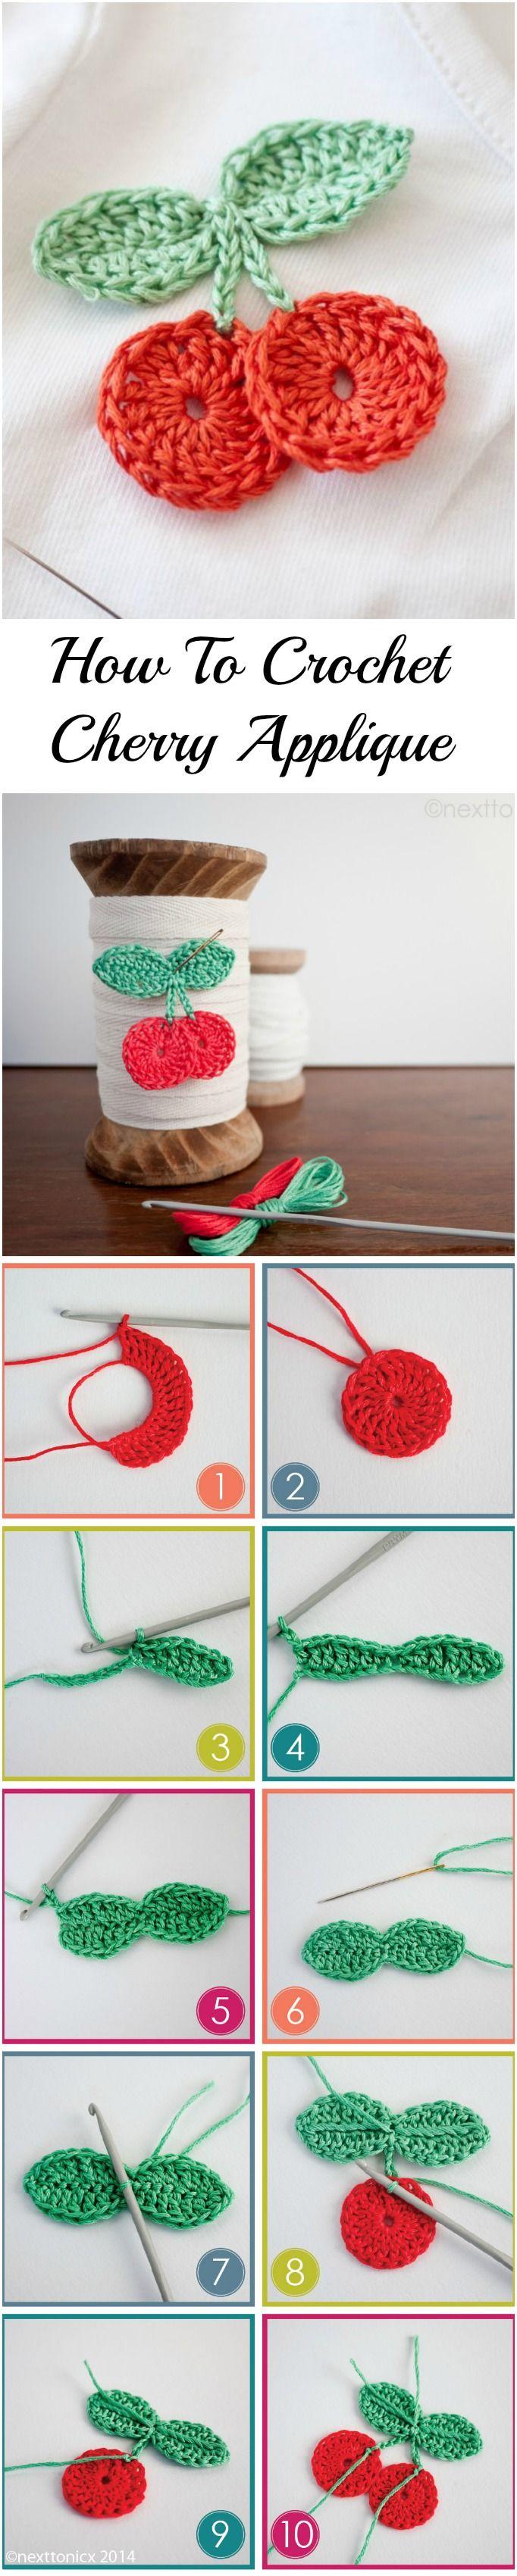 How To Crochet Cherry